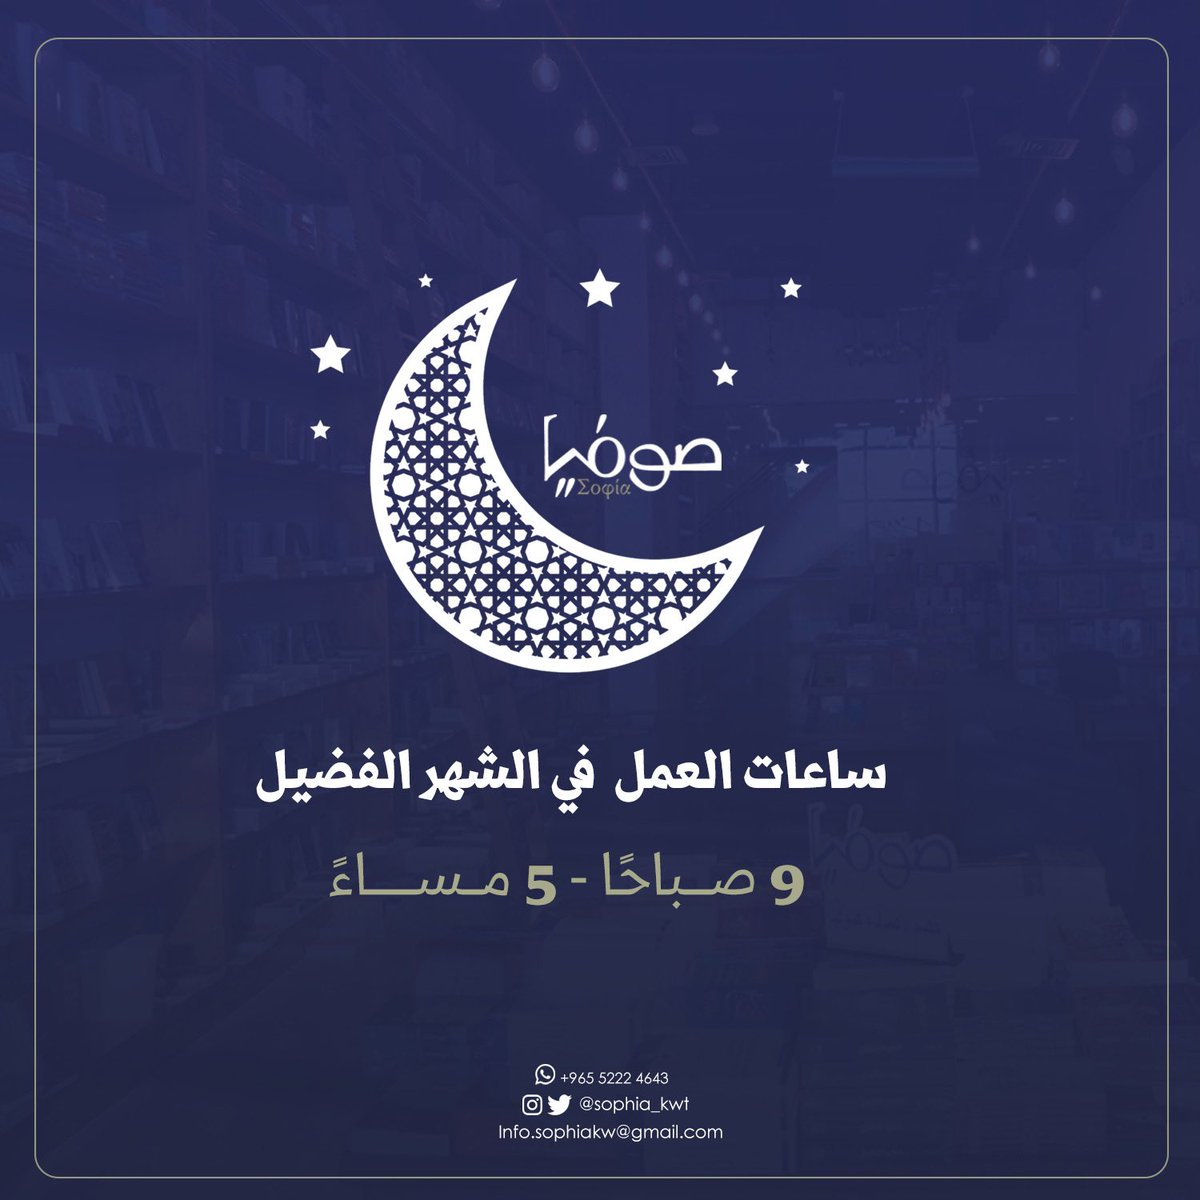 كل عام وأنتم بخير يا أصدقاء🌙✨ #رمضان_مبارك https://t.co/KvWVAHonFN